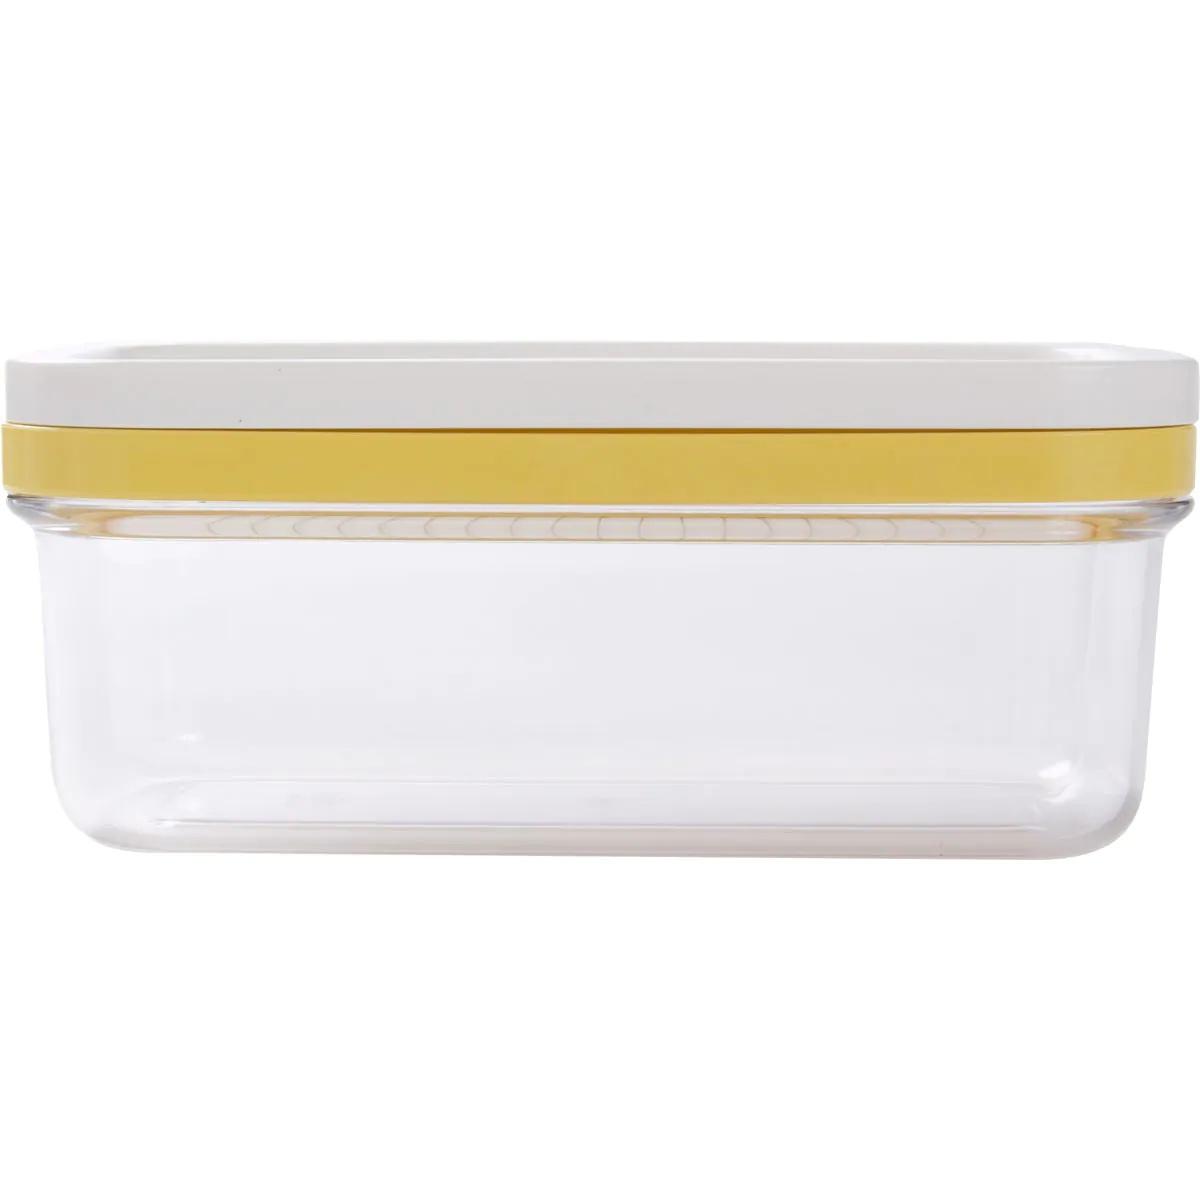 NITORI(ニトリ) バターケースの商品画像9